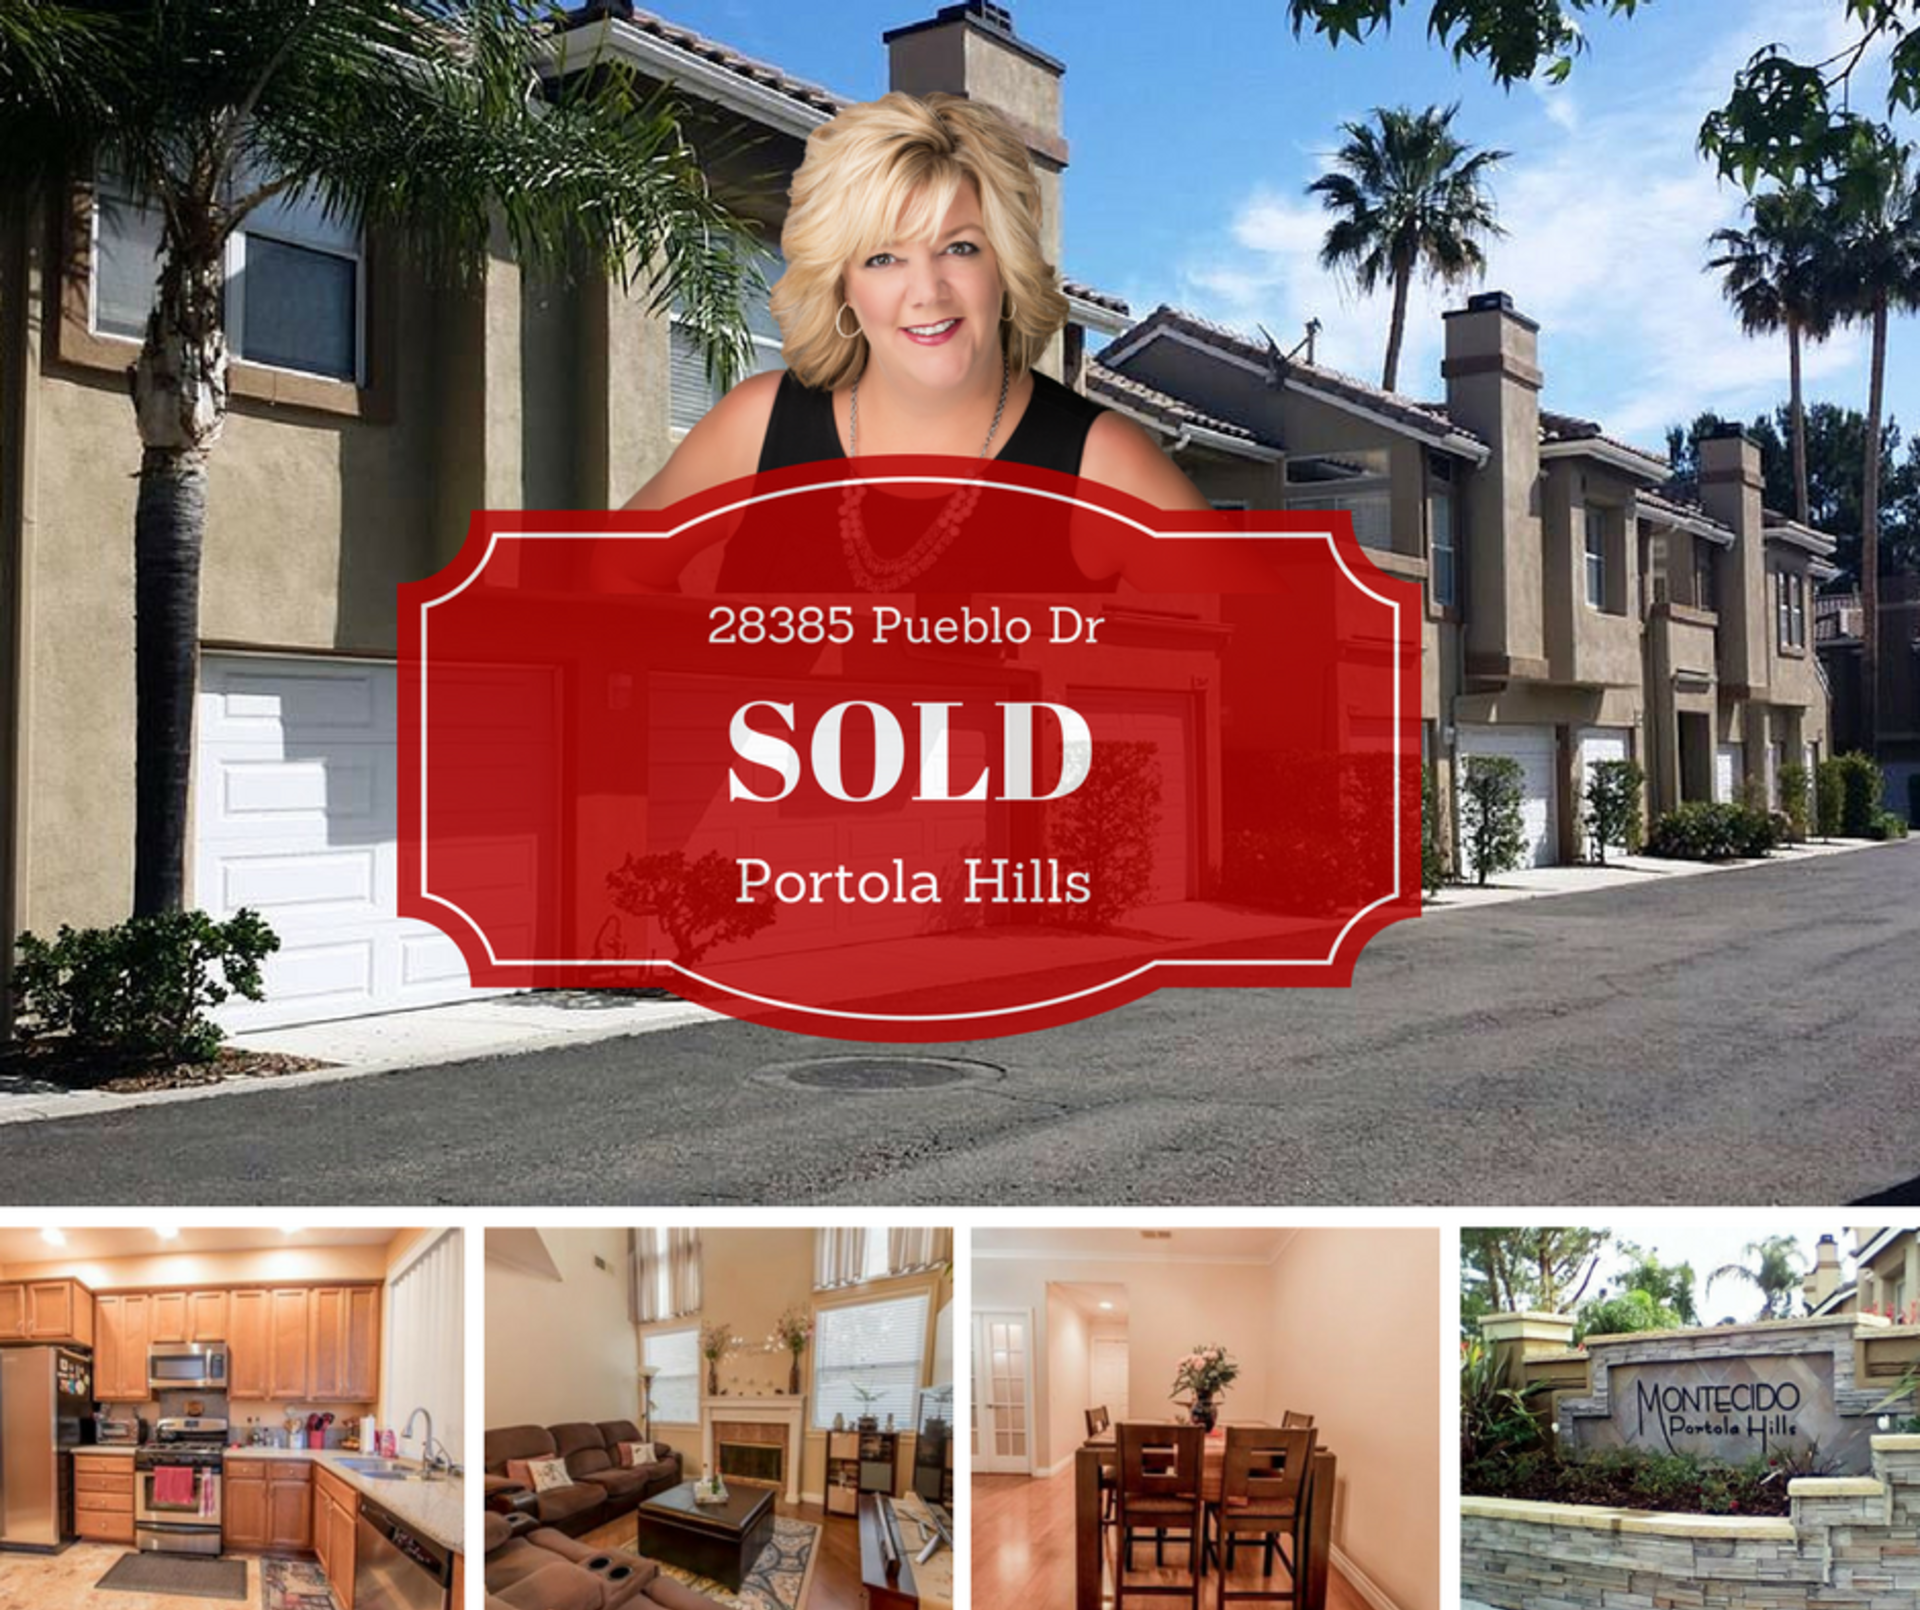 28385 Pueblo Dr.  Portola Hills Sold